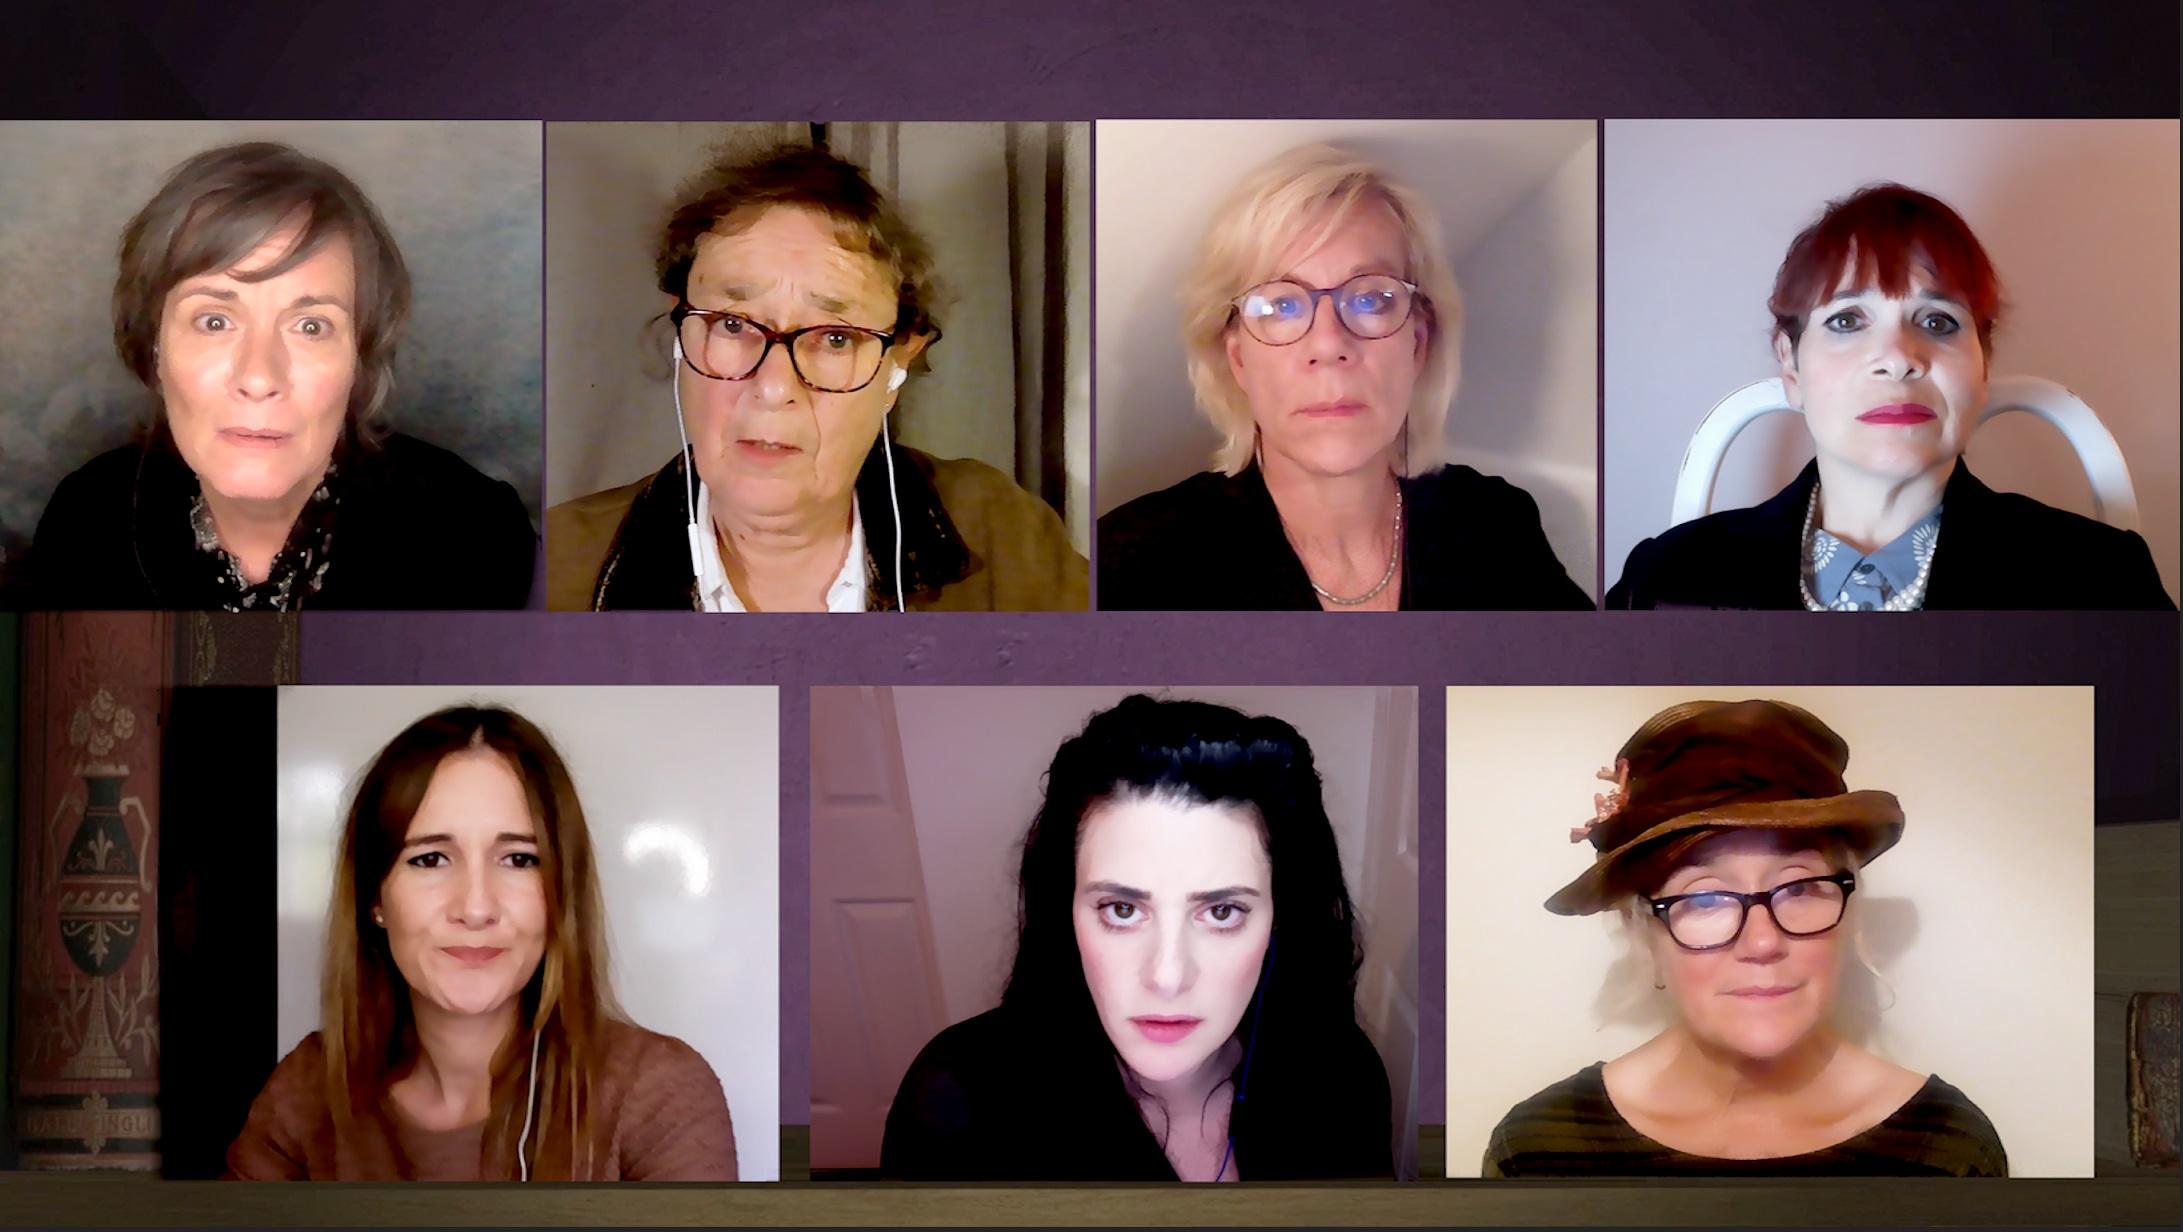 (L-R) Catherine Russell, Sarah Solemani, Linda Basset, Natasha Karp, Juliet Stevenson, Sophie Thompson, and Debbie Chazen, Little Wars (Credit John Brannoch)